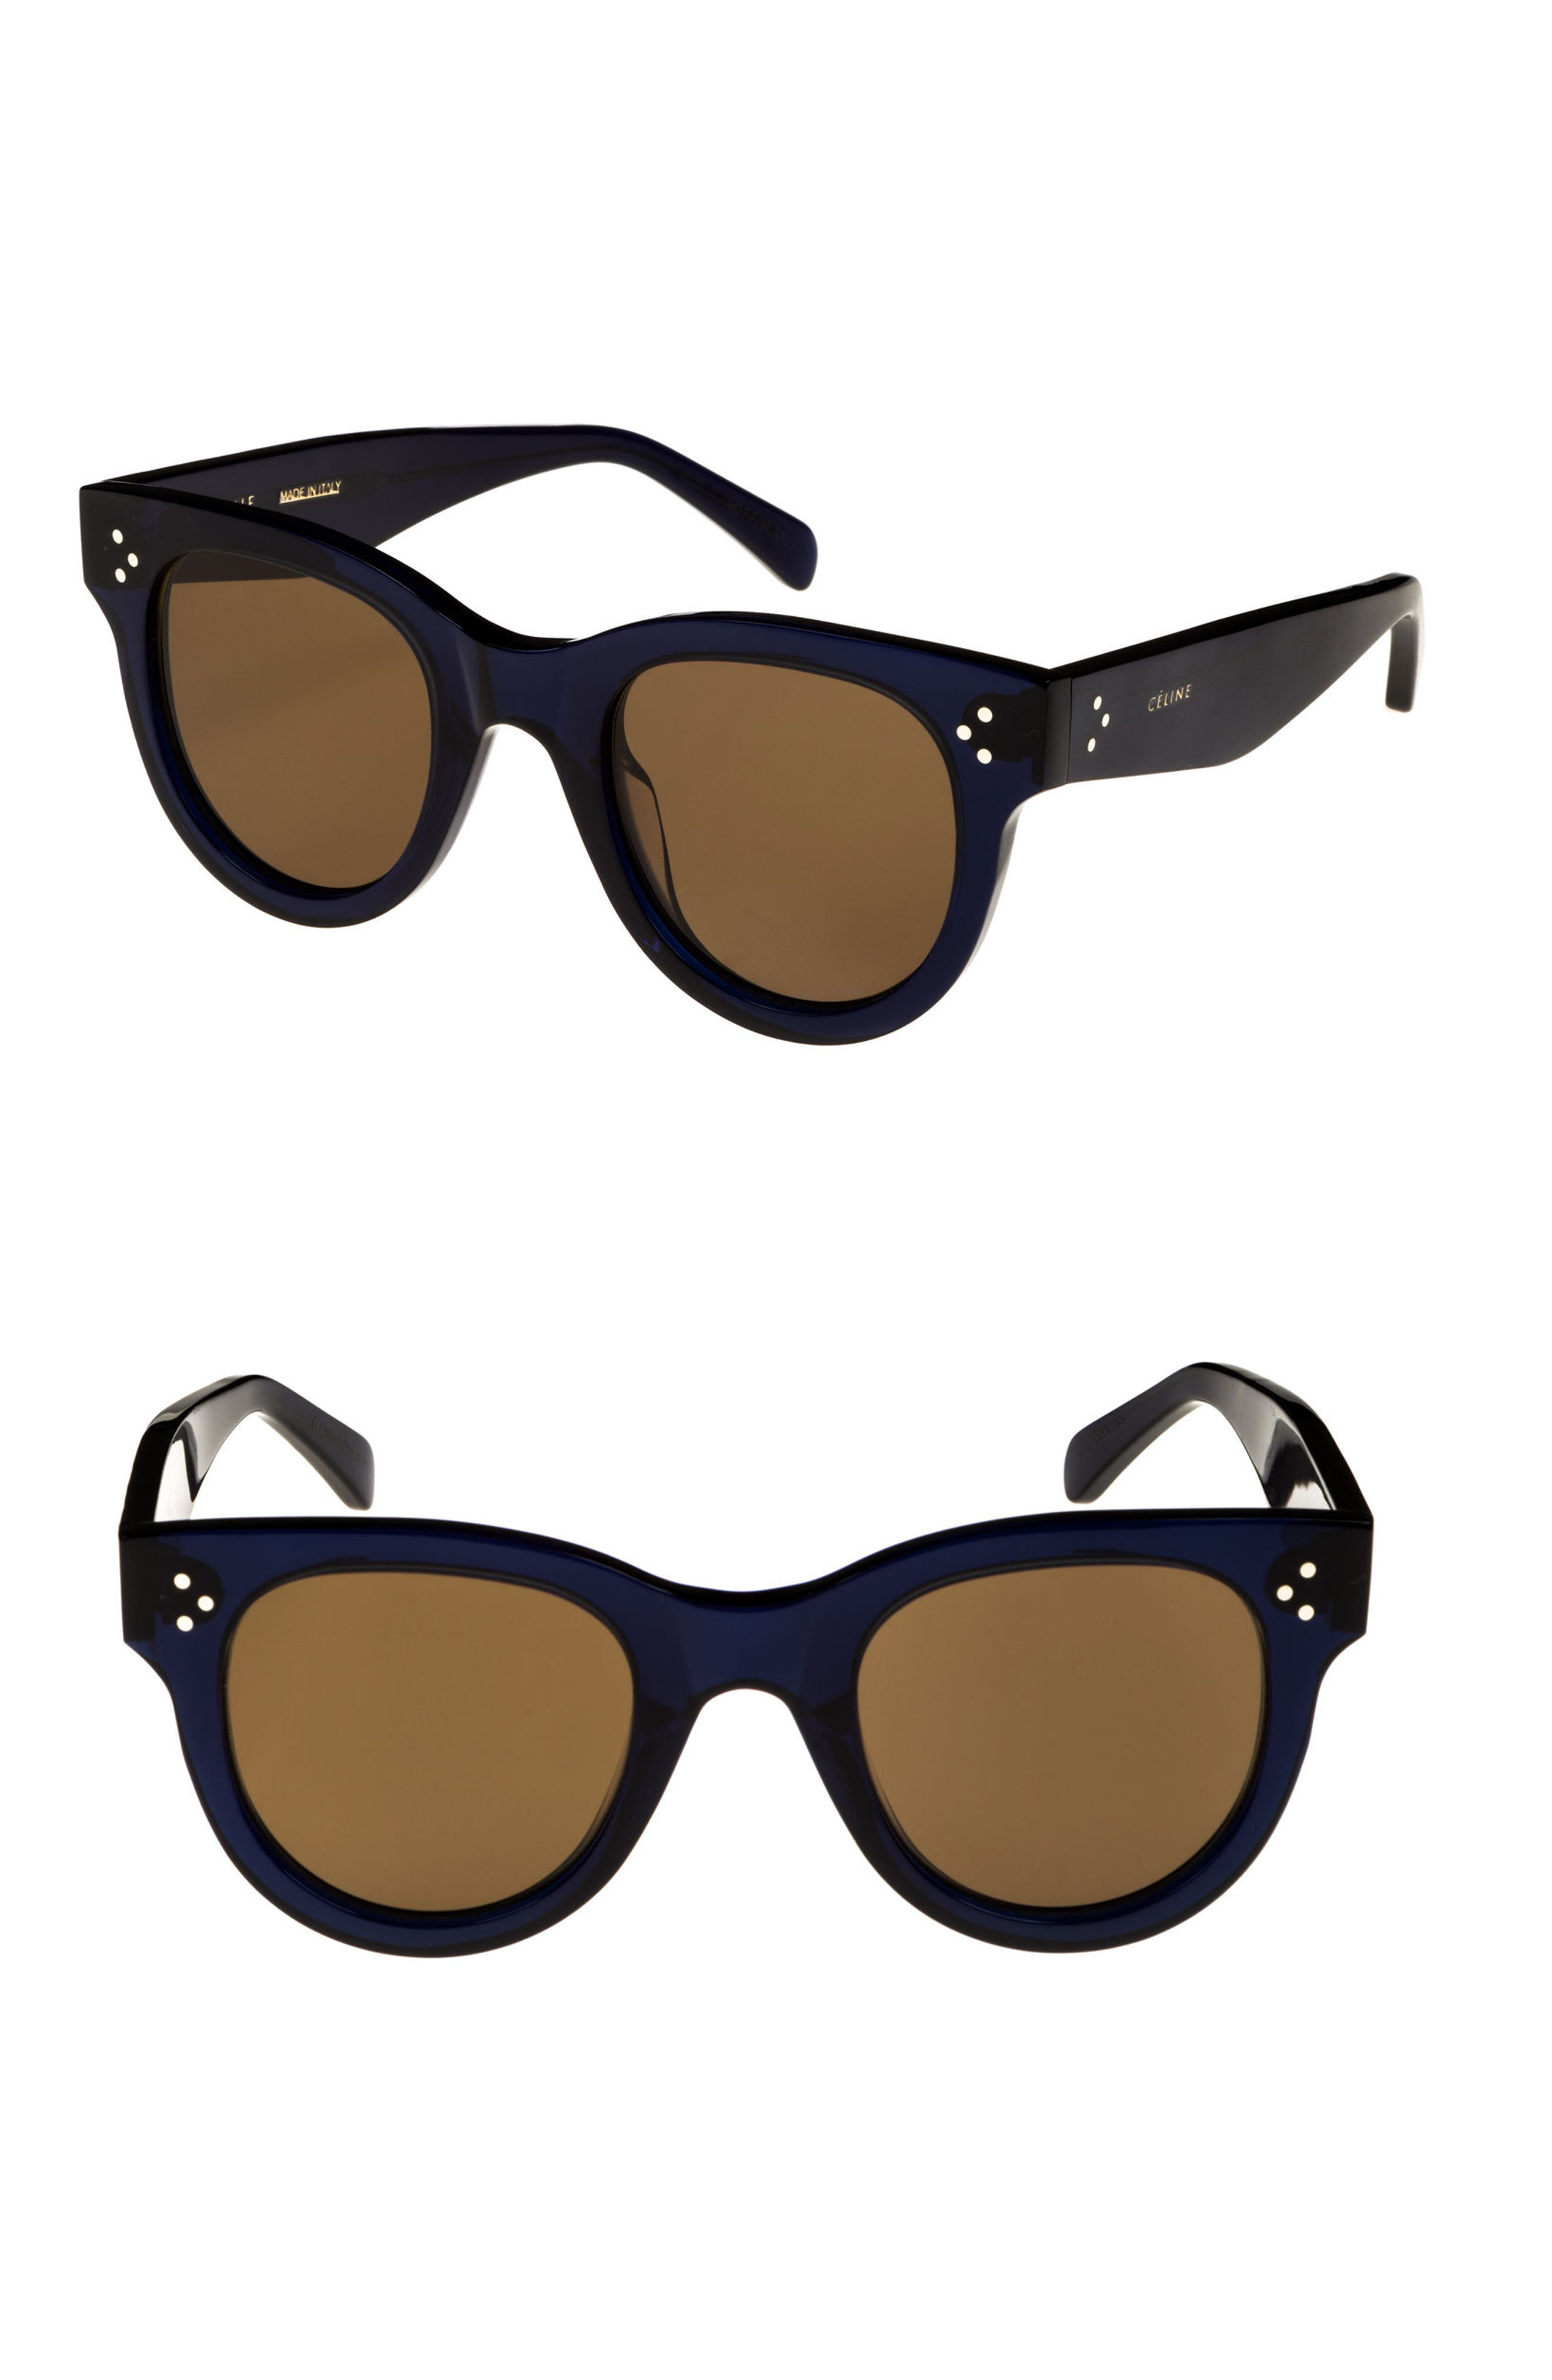 48mm Round Sunglasses,                         Main,                         color,